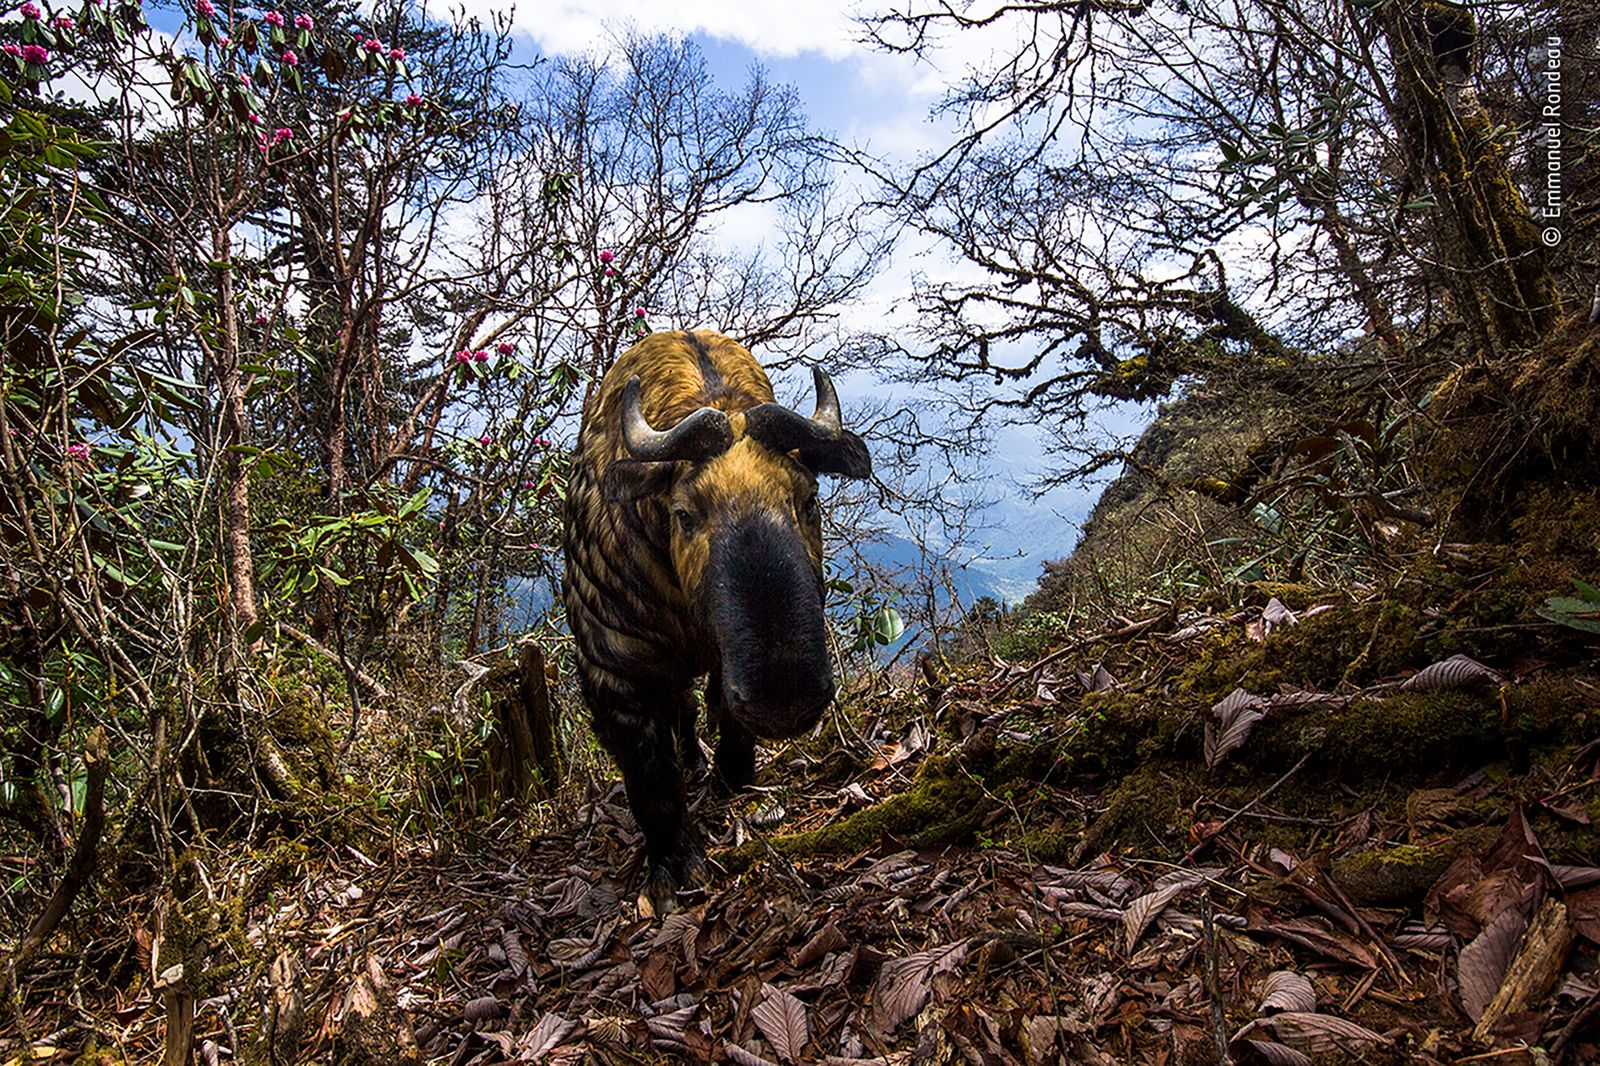 Spirit of Bhutan by Emmanuel Rondeau, France